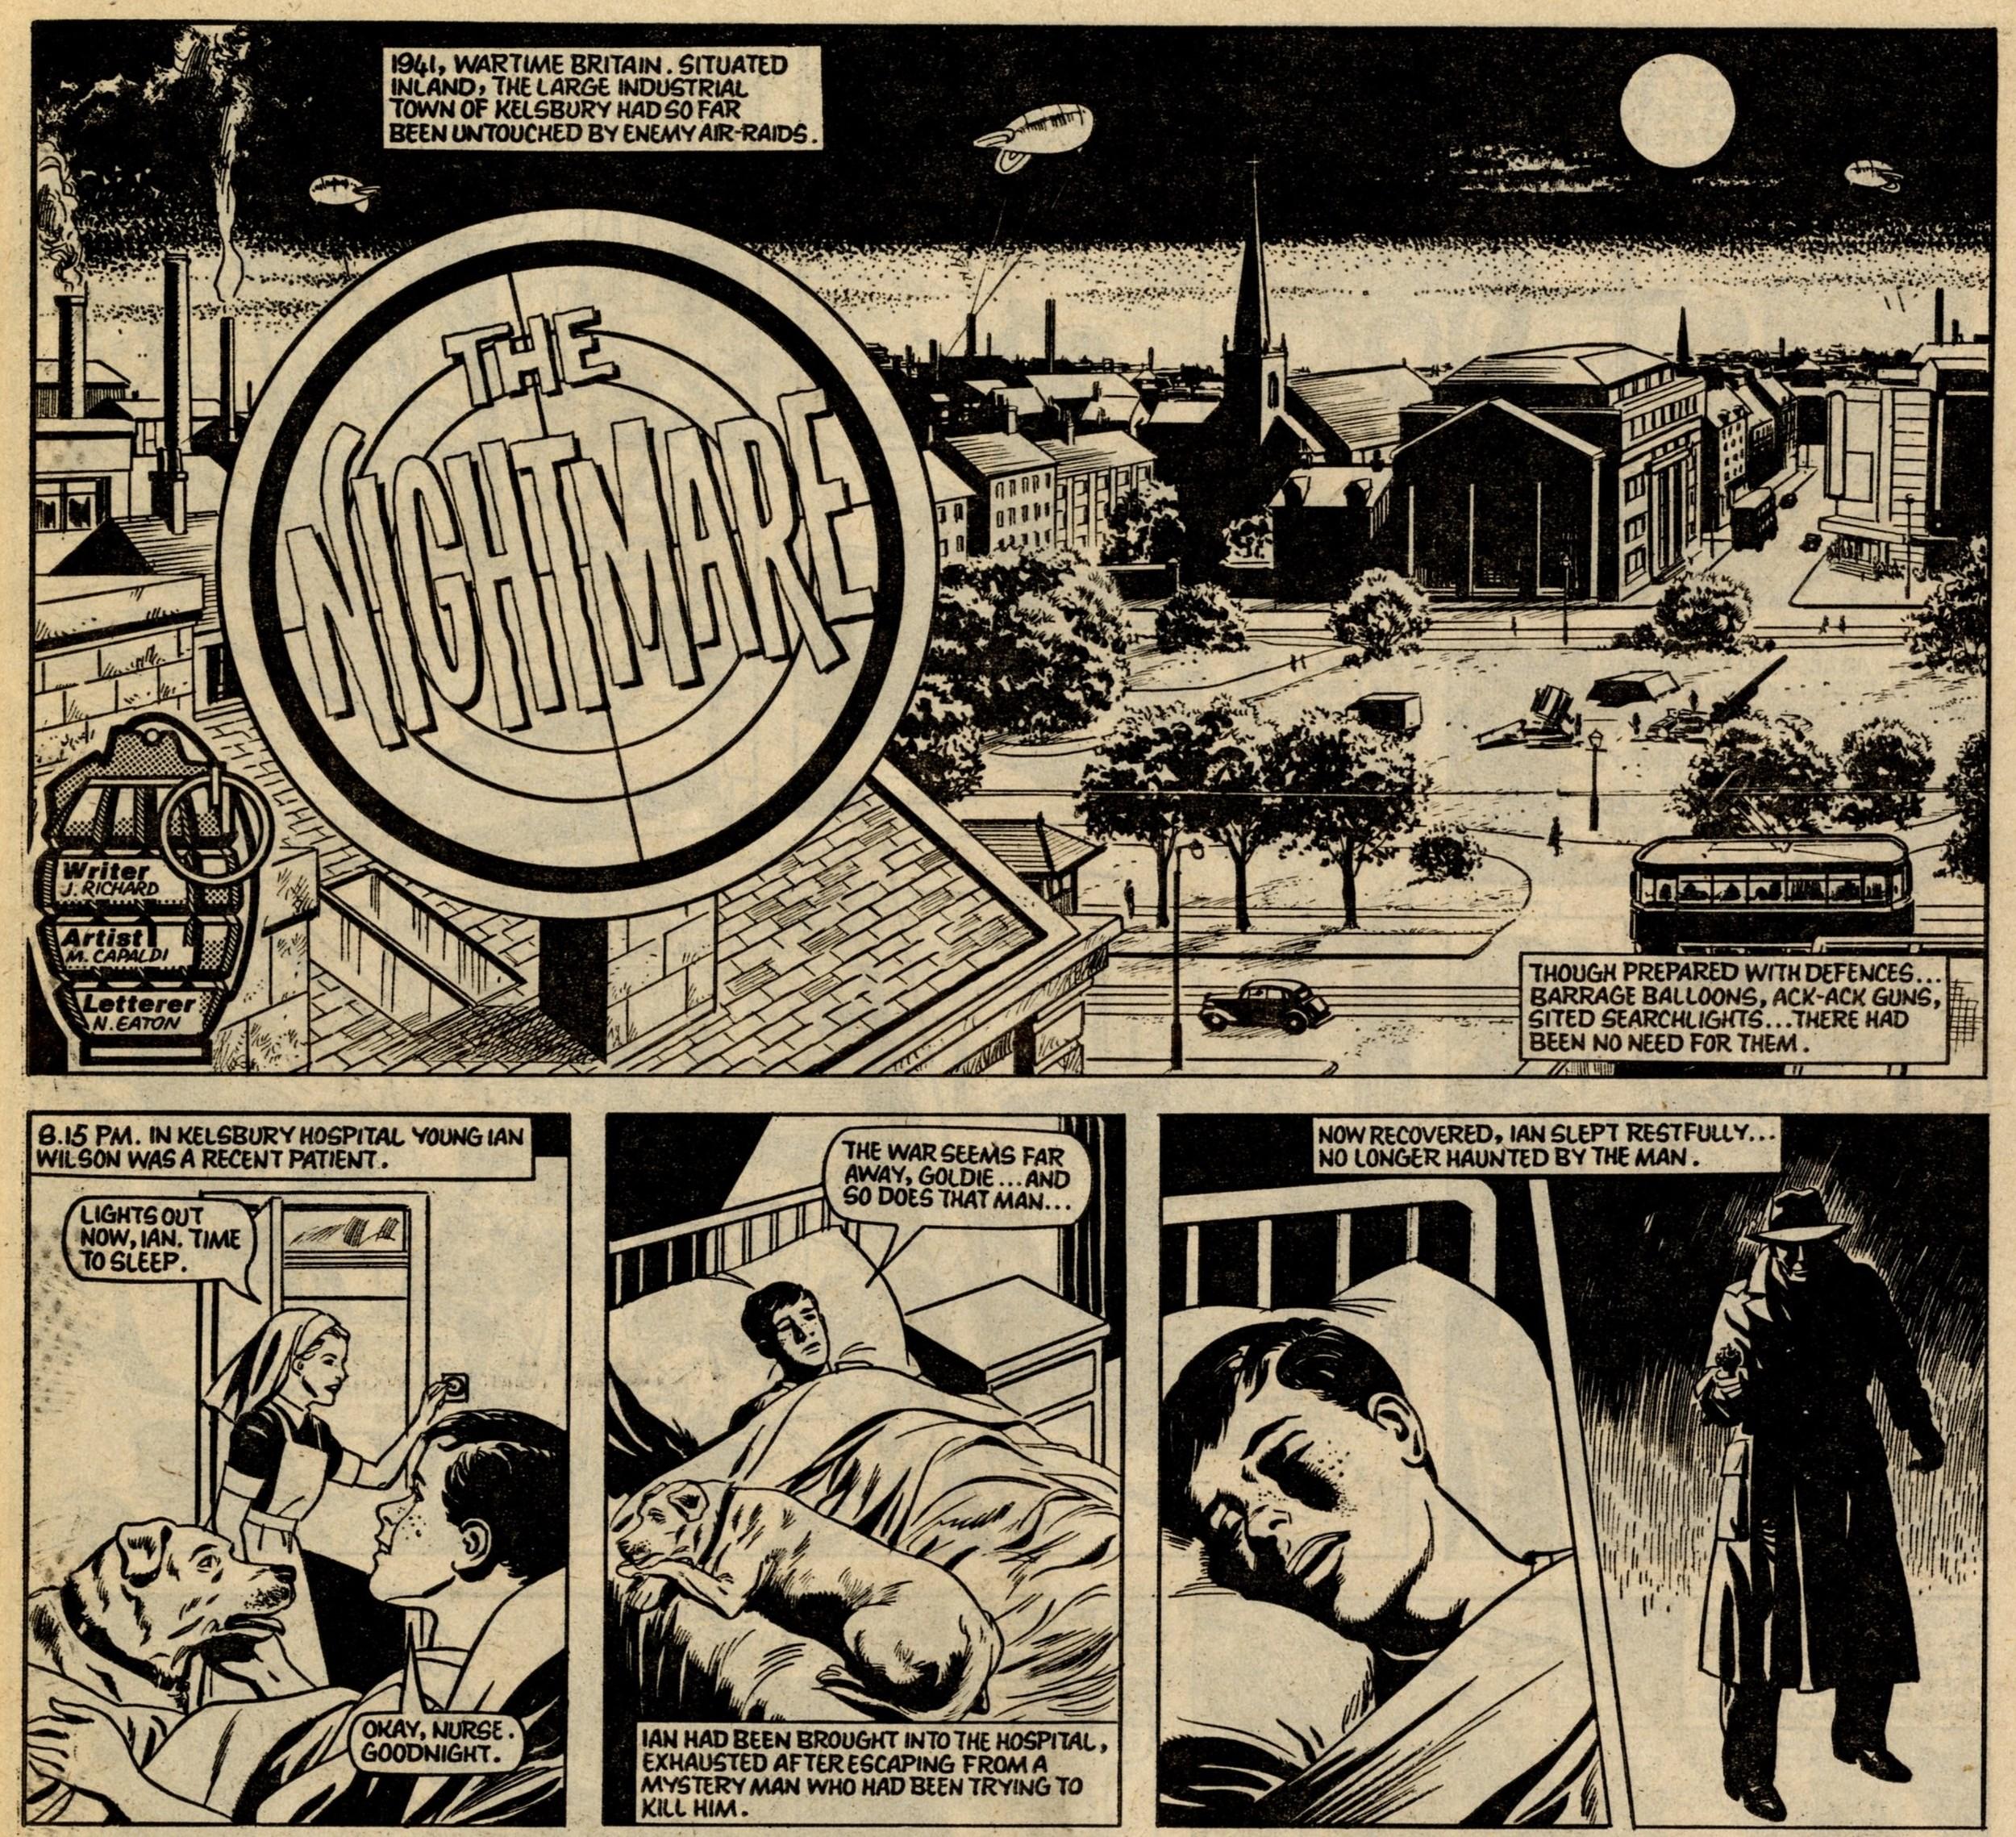 The Nightmare: Terry Magee (writer), Mario Capaldi (artist)